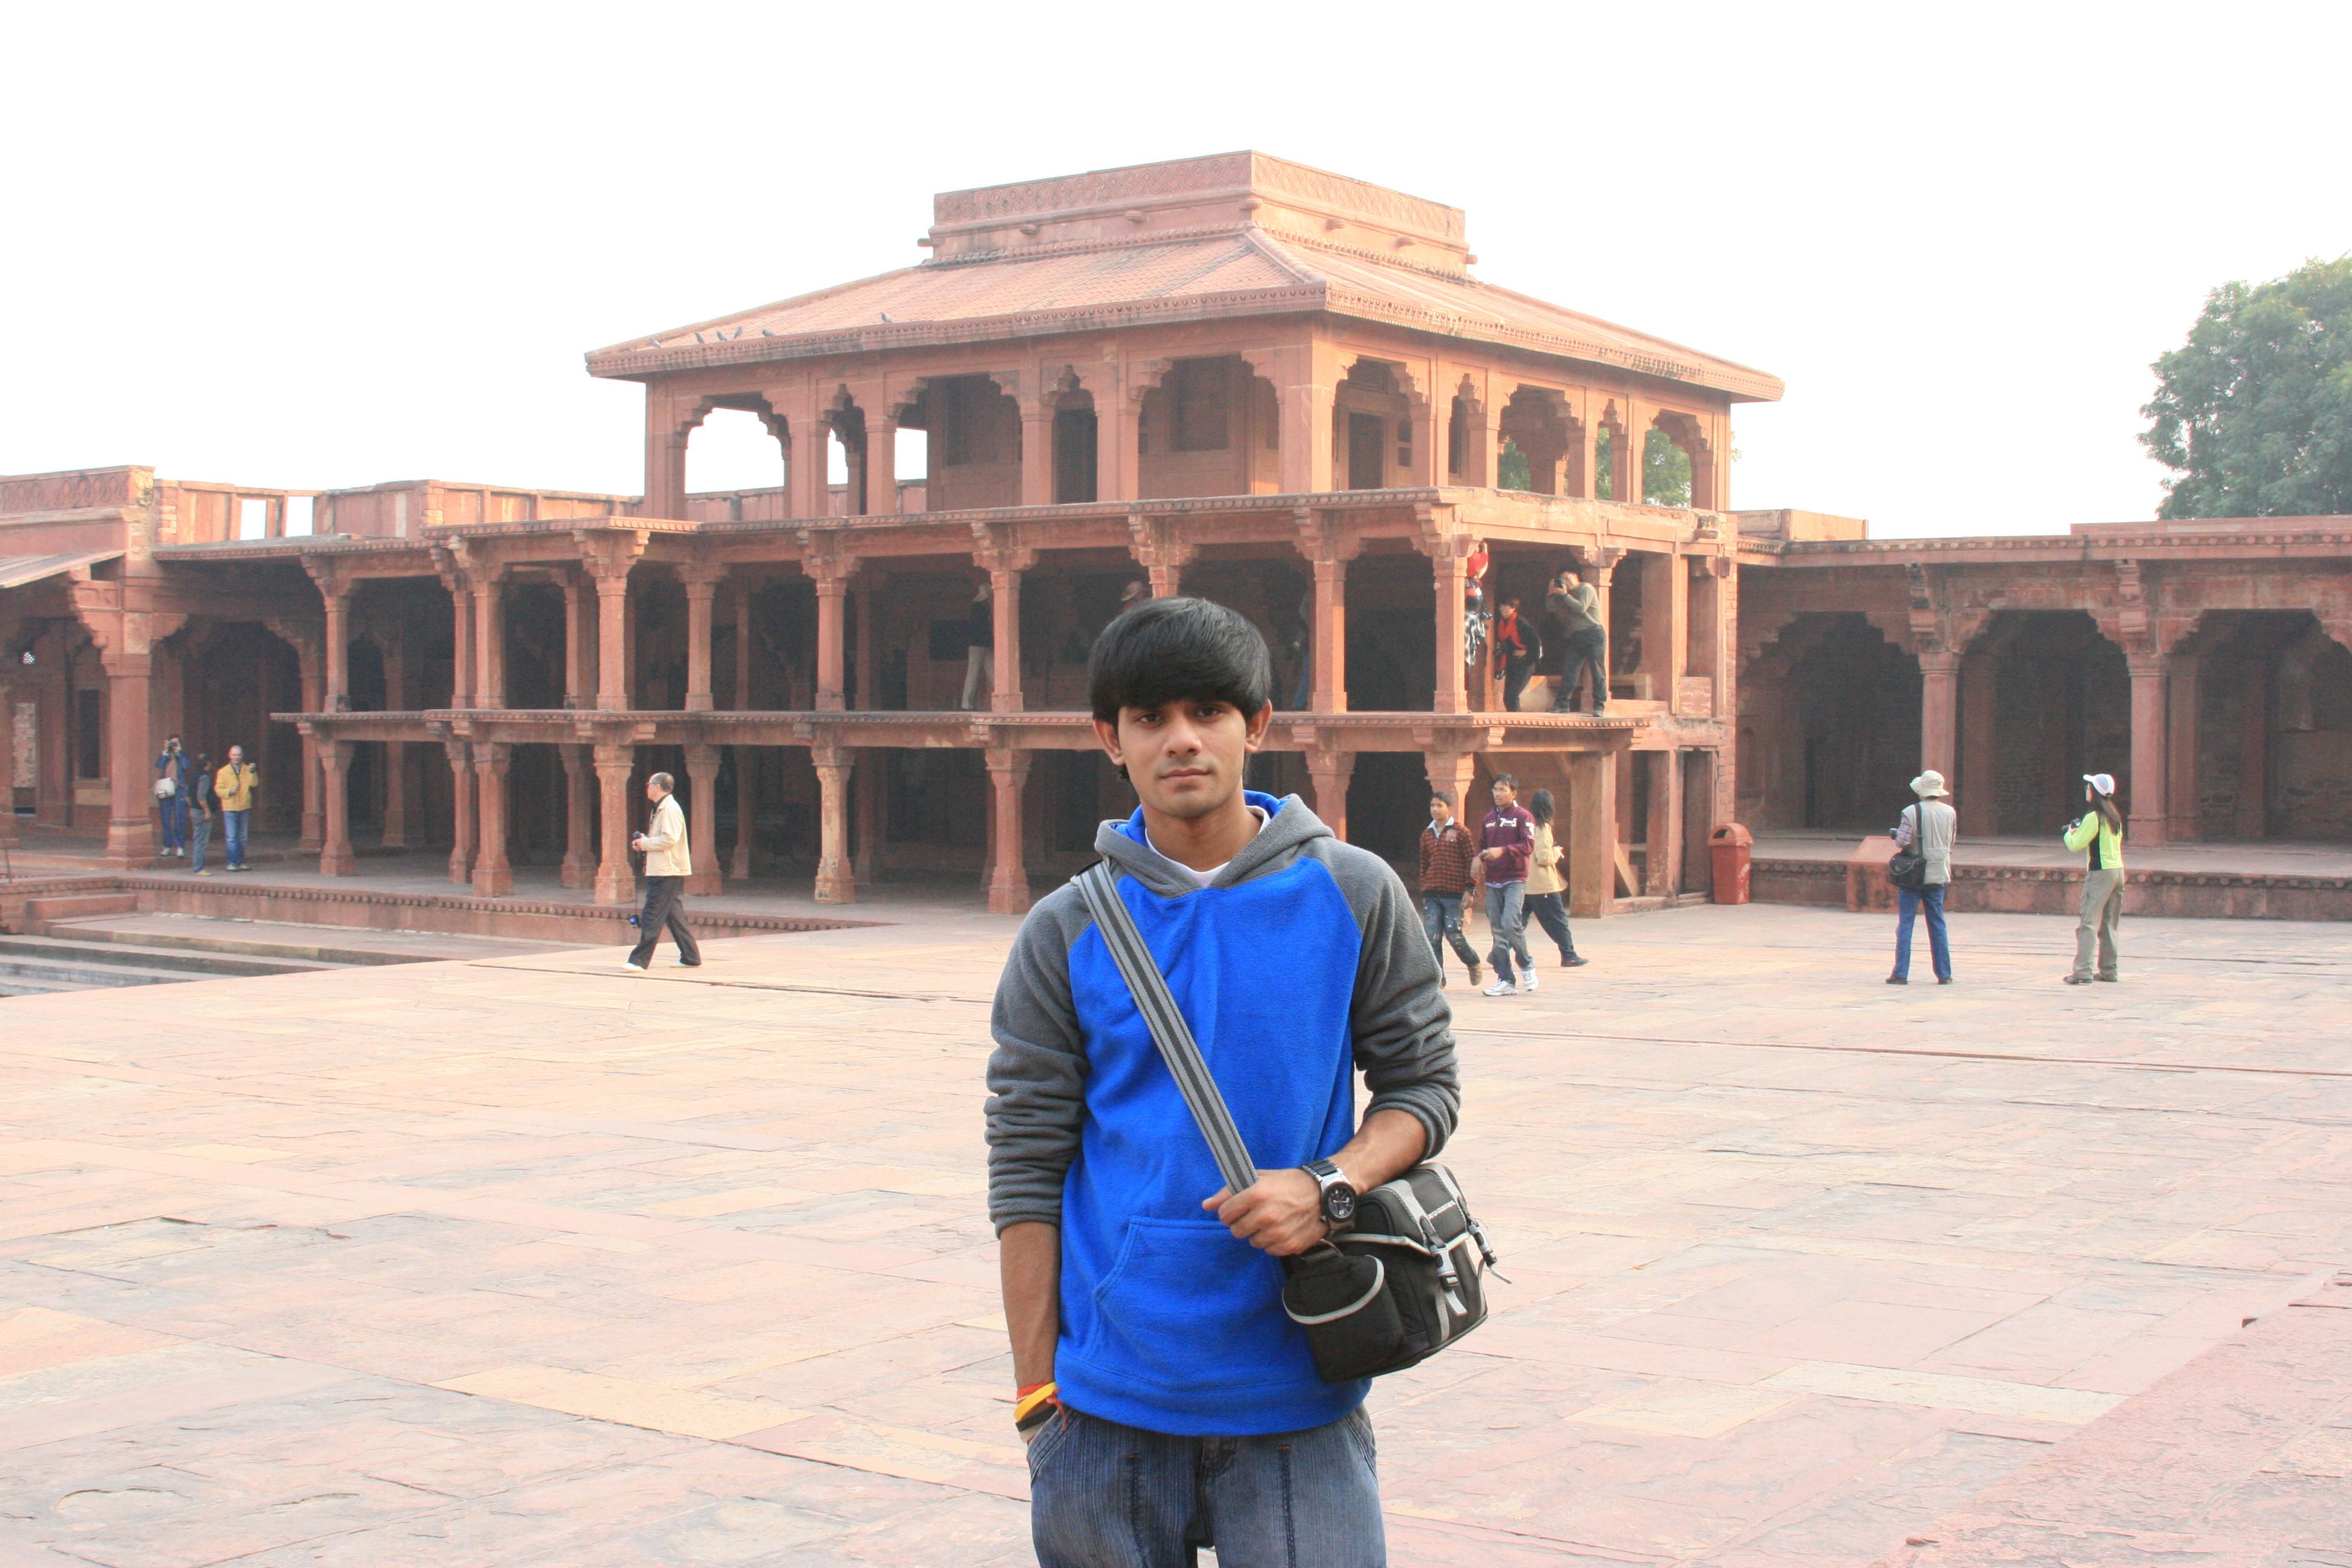 Fatehpur Sikri arjun bhatnagar